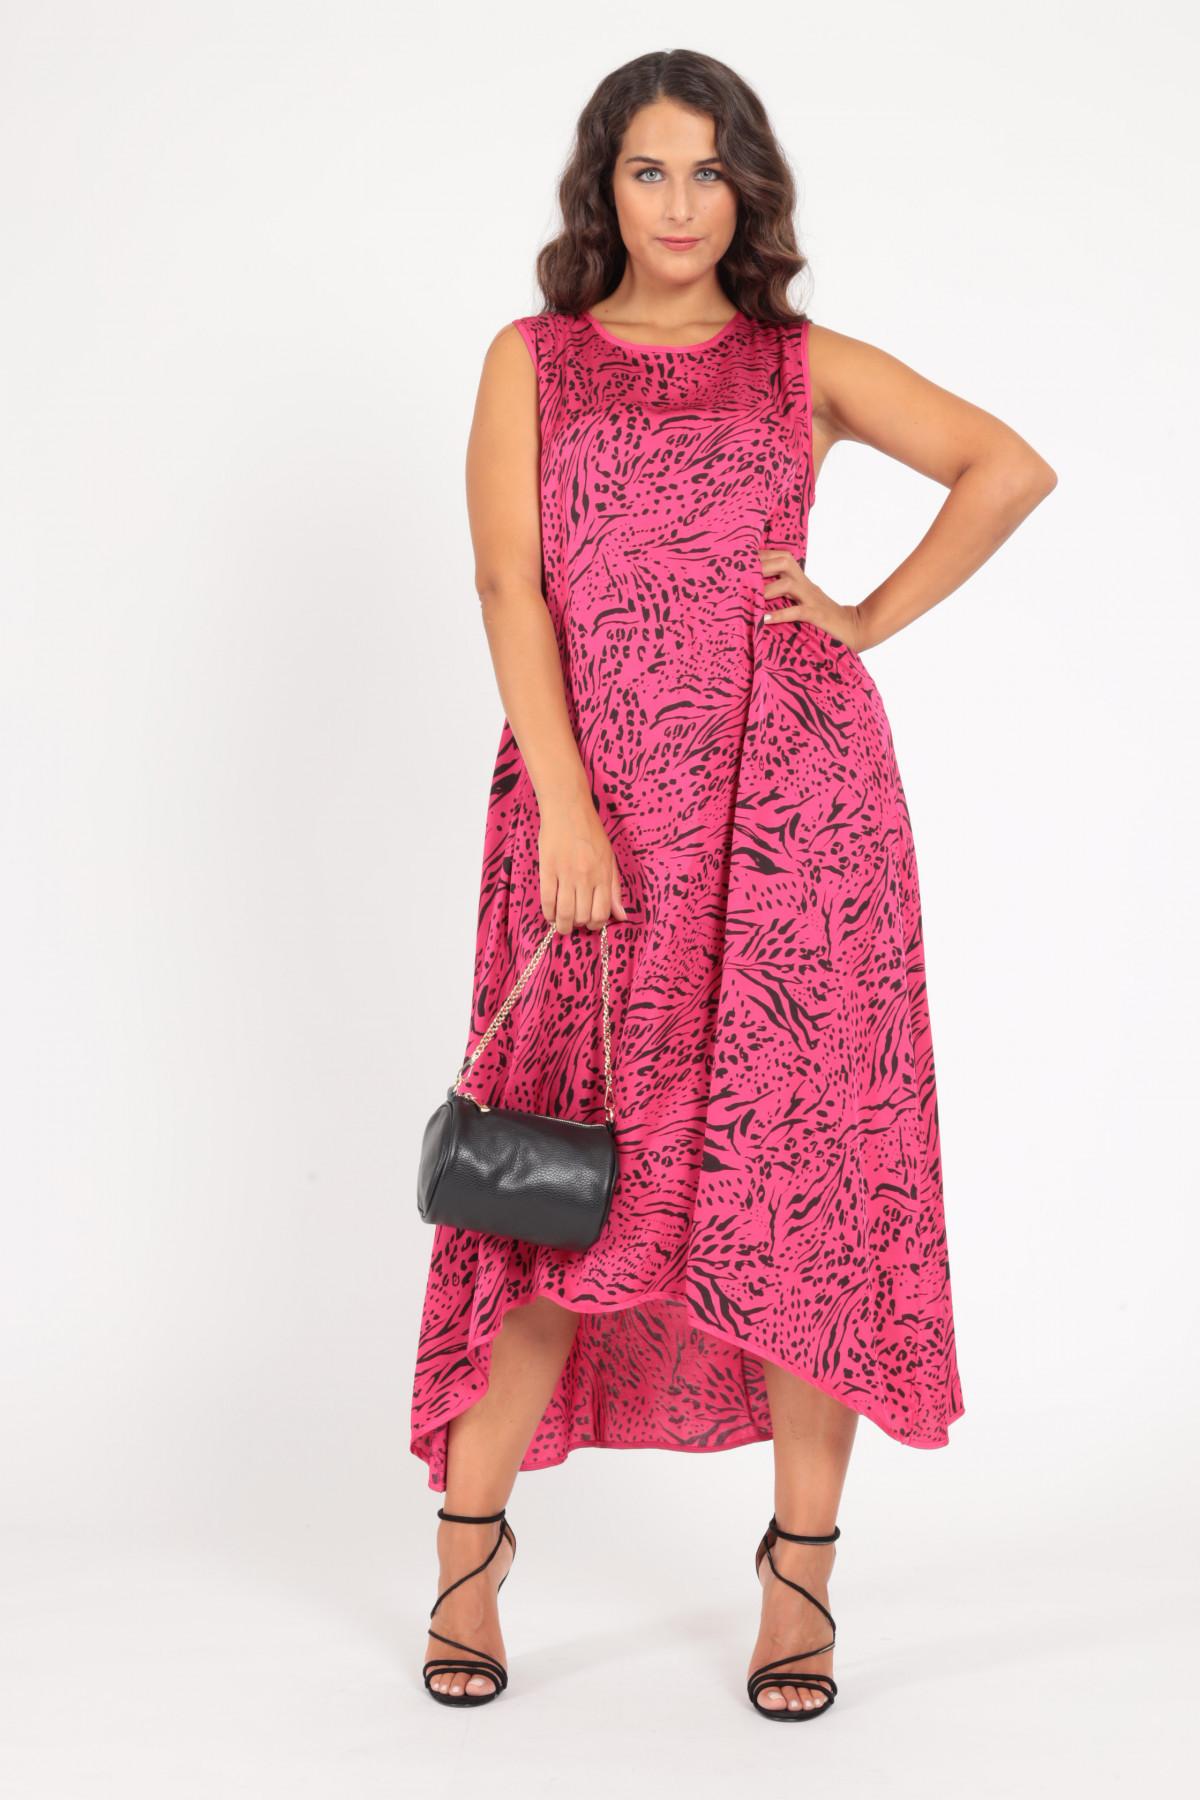 Sleeveless Satin Effect Dress in Animalier Print